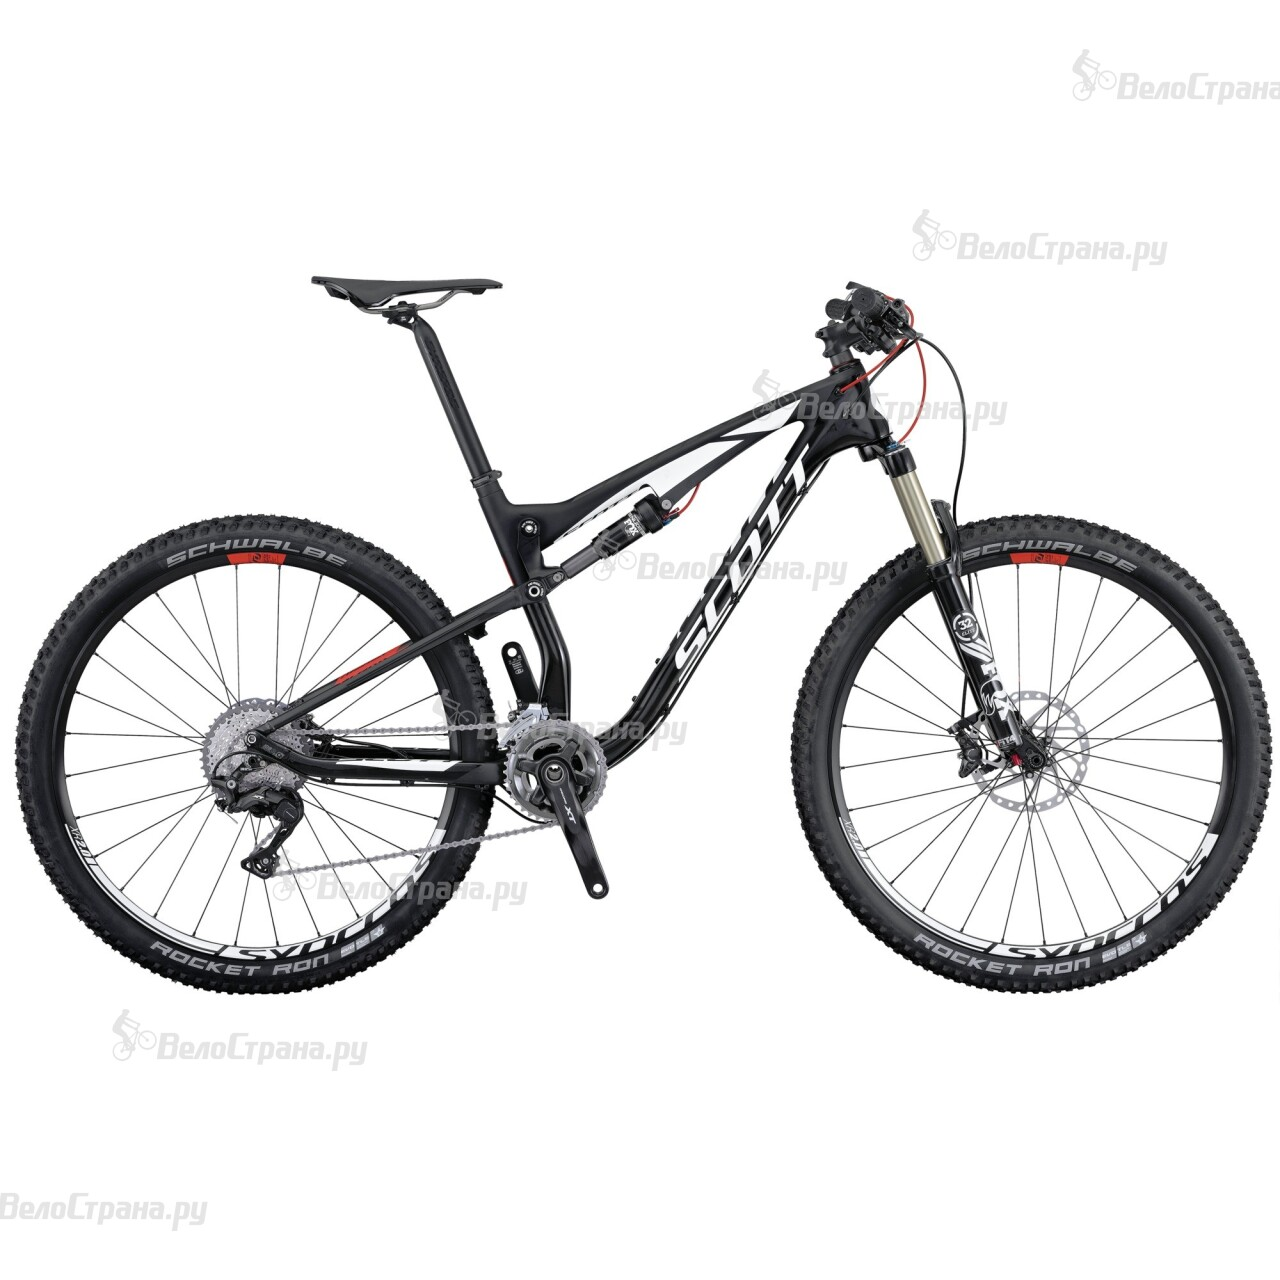 Велосипед Scott Spark 910 (2016)